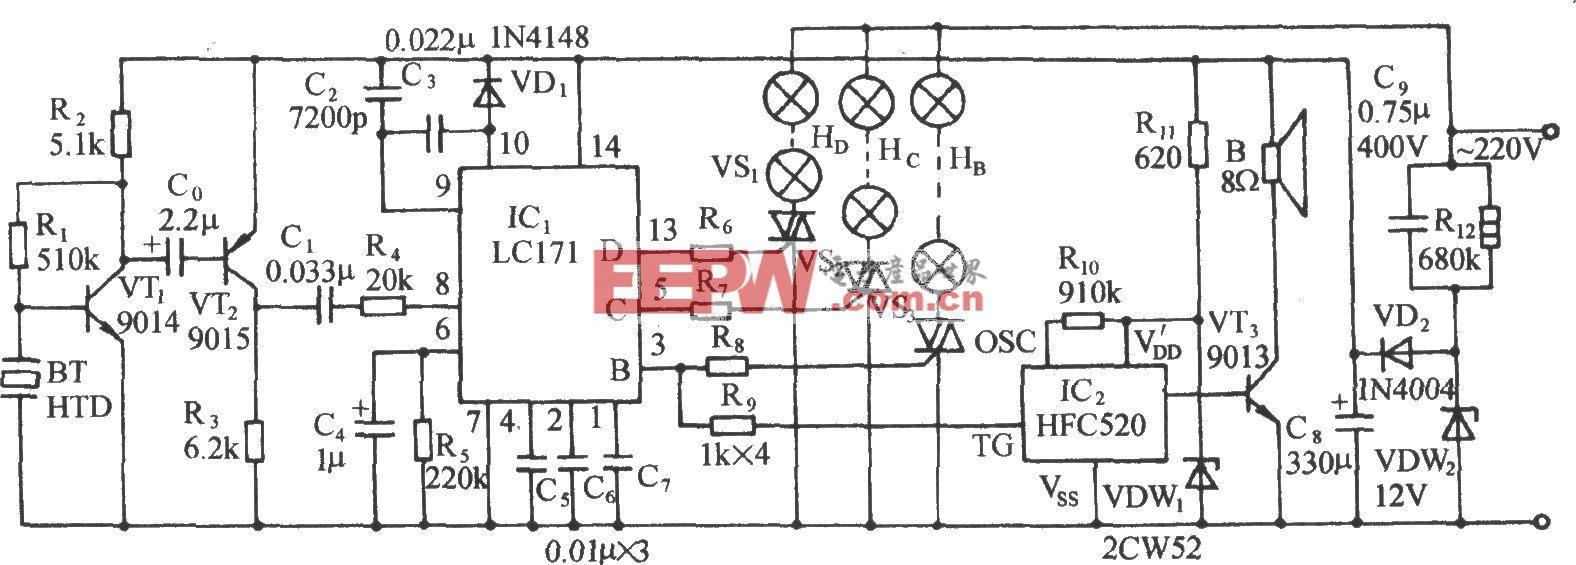 LCl71音频压控三路彩灯伴鞭炮声控制电路